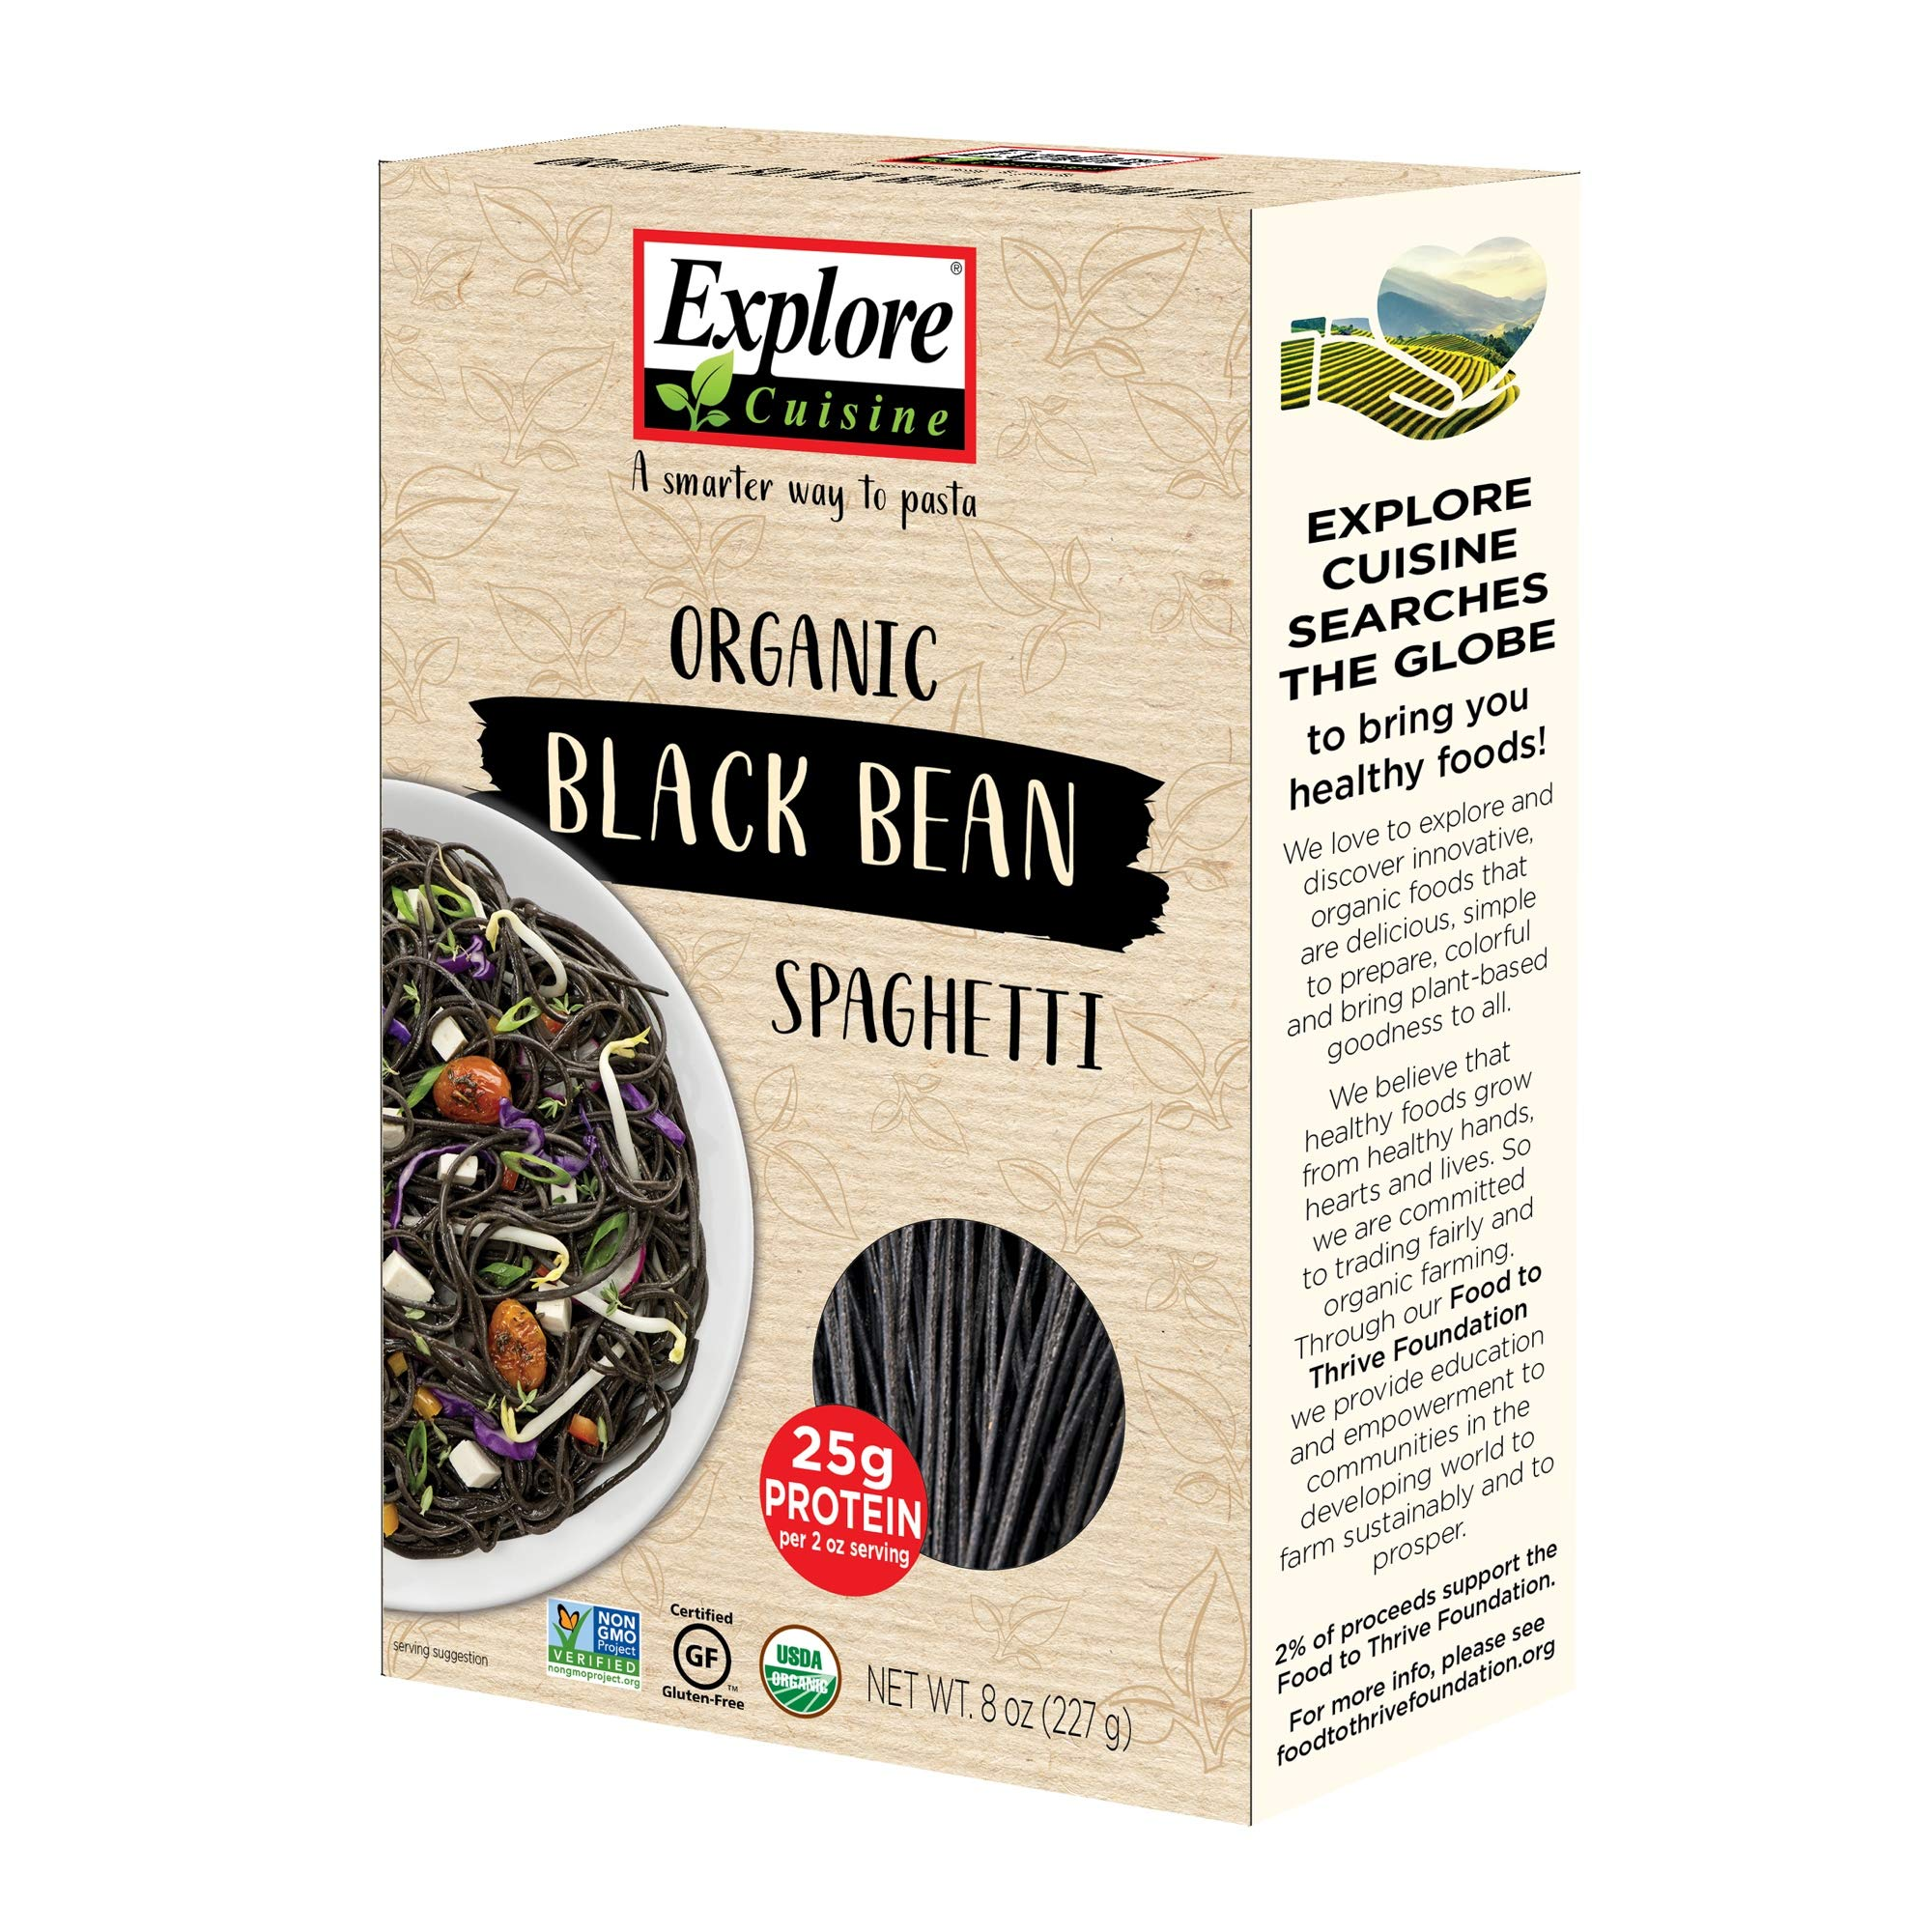 Explore Cuisine Organic Black Bean Spaghetti - 8 oz - High Protein, Gluten Free Pasta, Easy to Make - USDA Certified Organic, Vegan, Kosher, Non GMO - 4 Servings